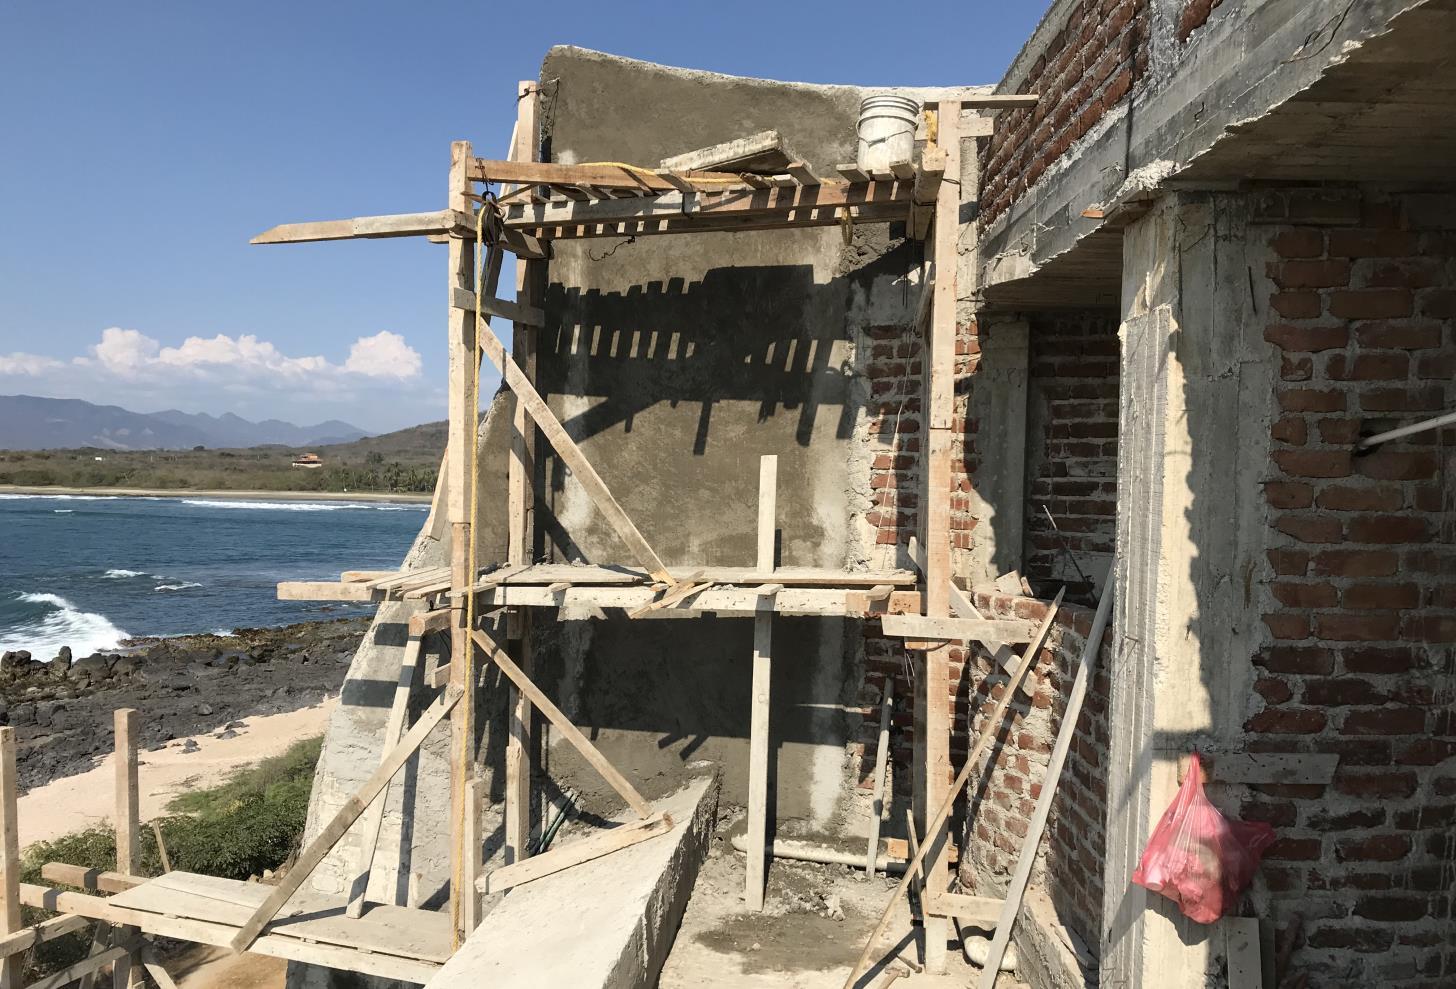 REPORTE-FOTOGRAFICO-PUNTA-MAJAHUA-09-DE-FEBRERO-DEL-2018-046.jpg